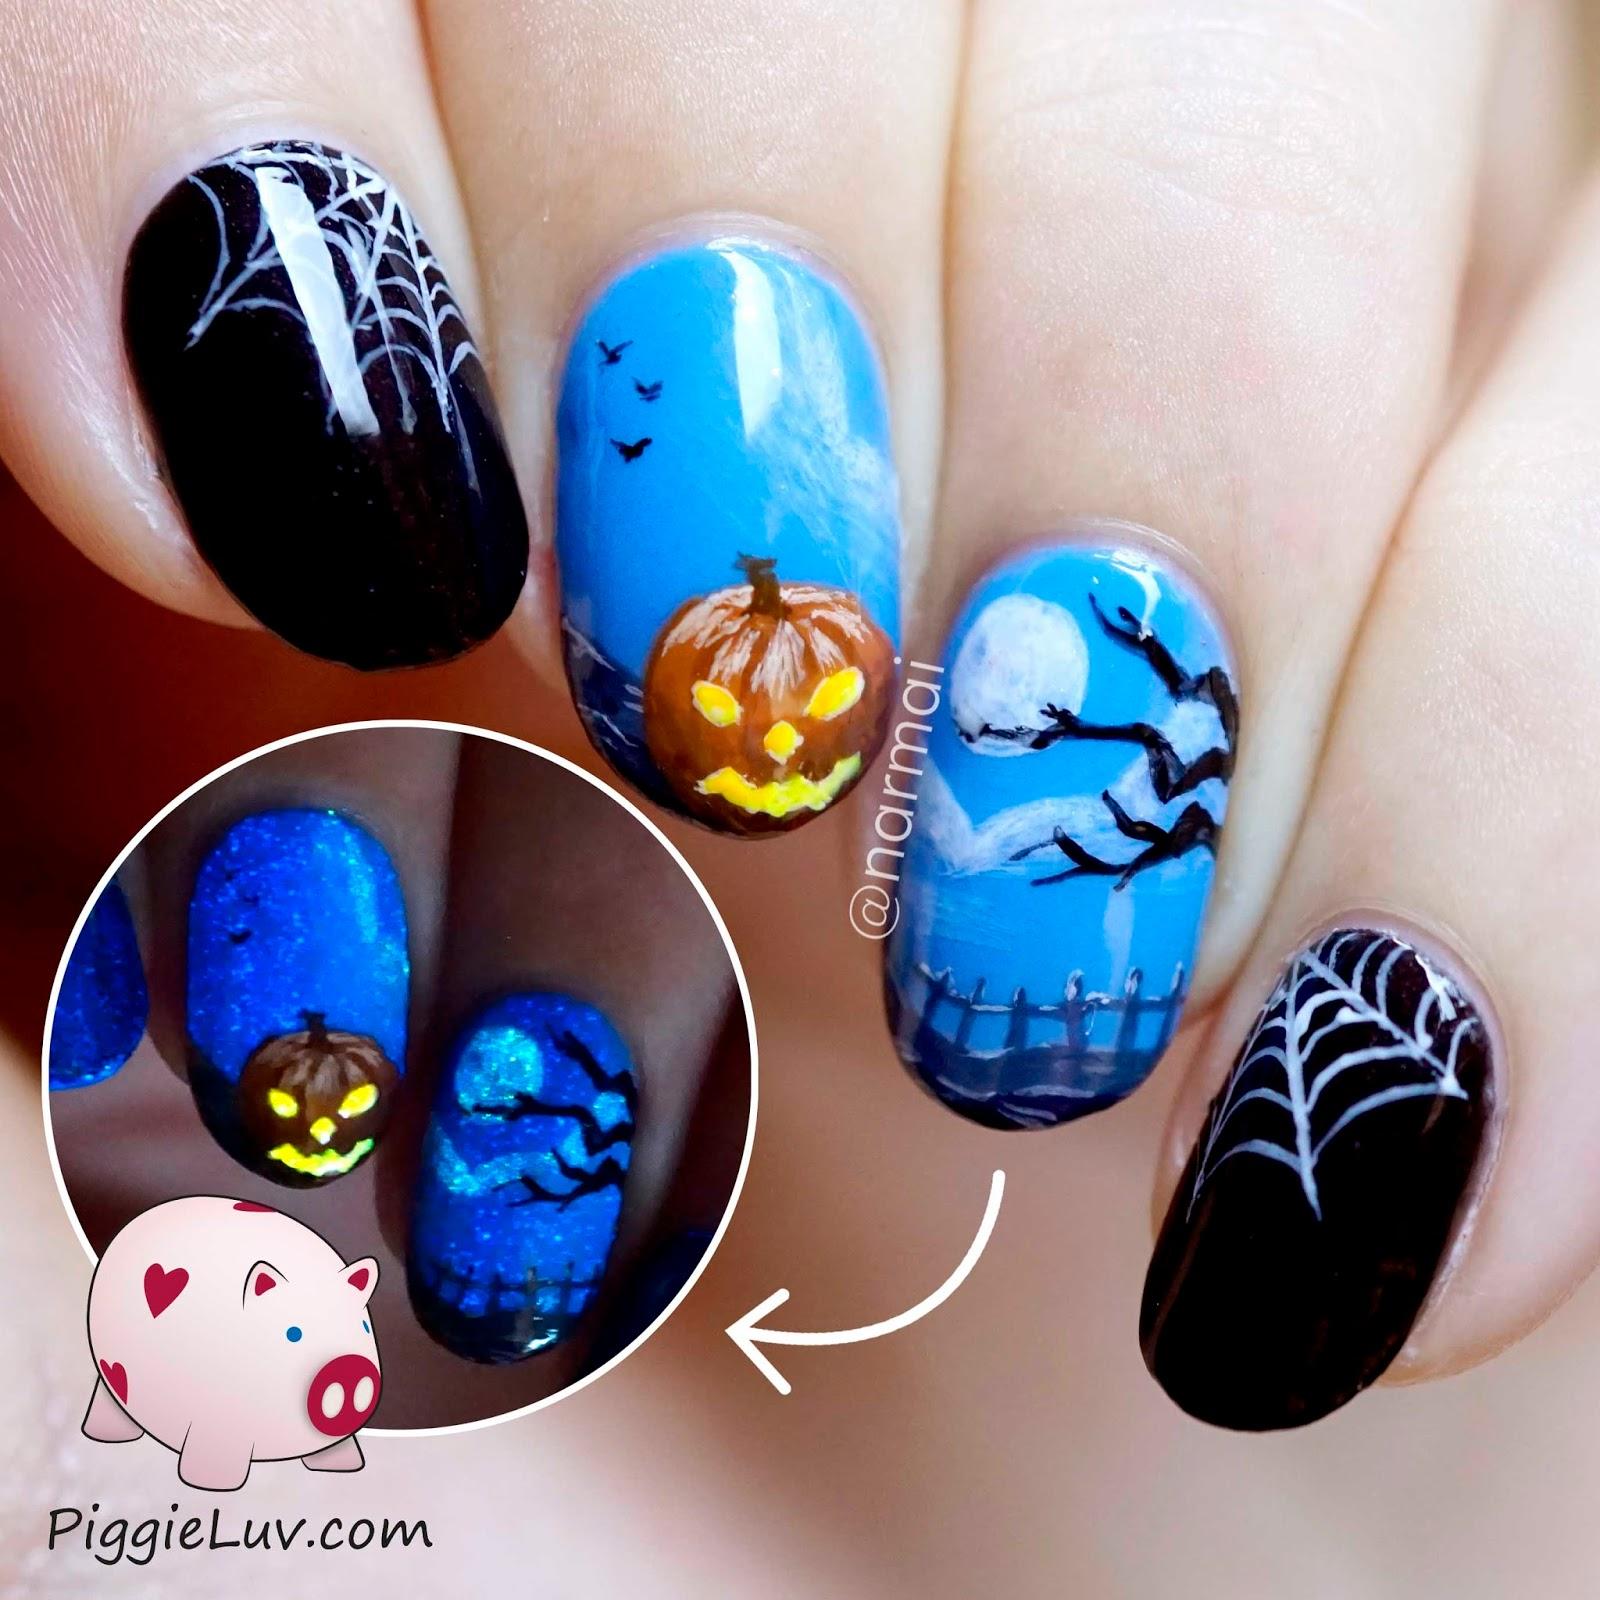 Piggieluv Happy Halloween Nail Art Hpb Linkup